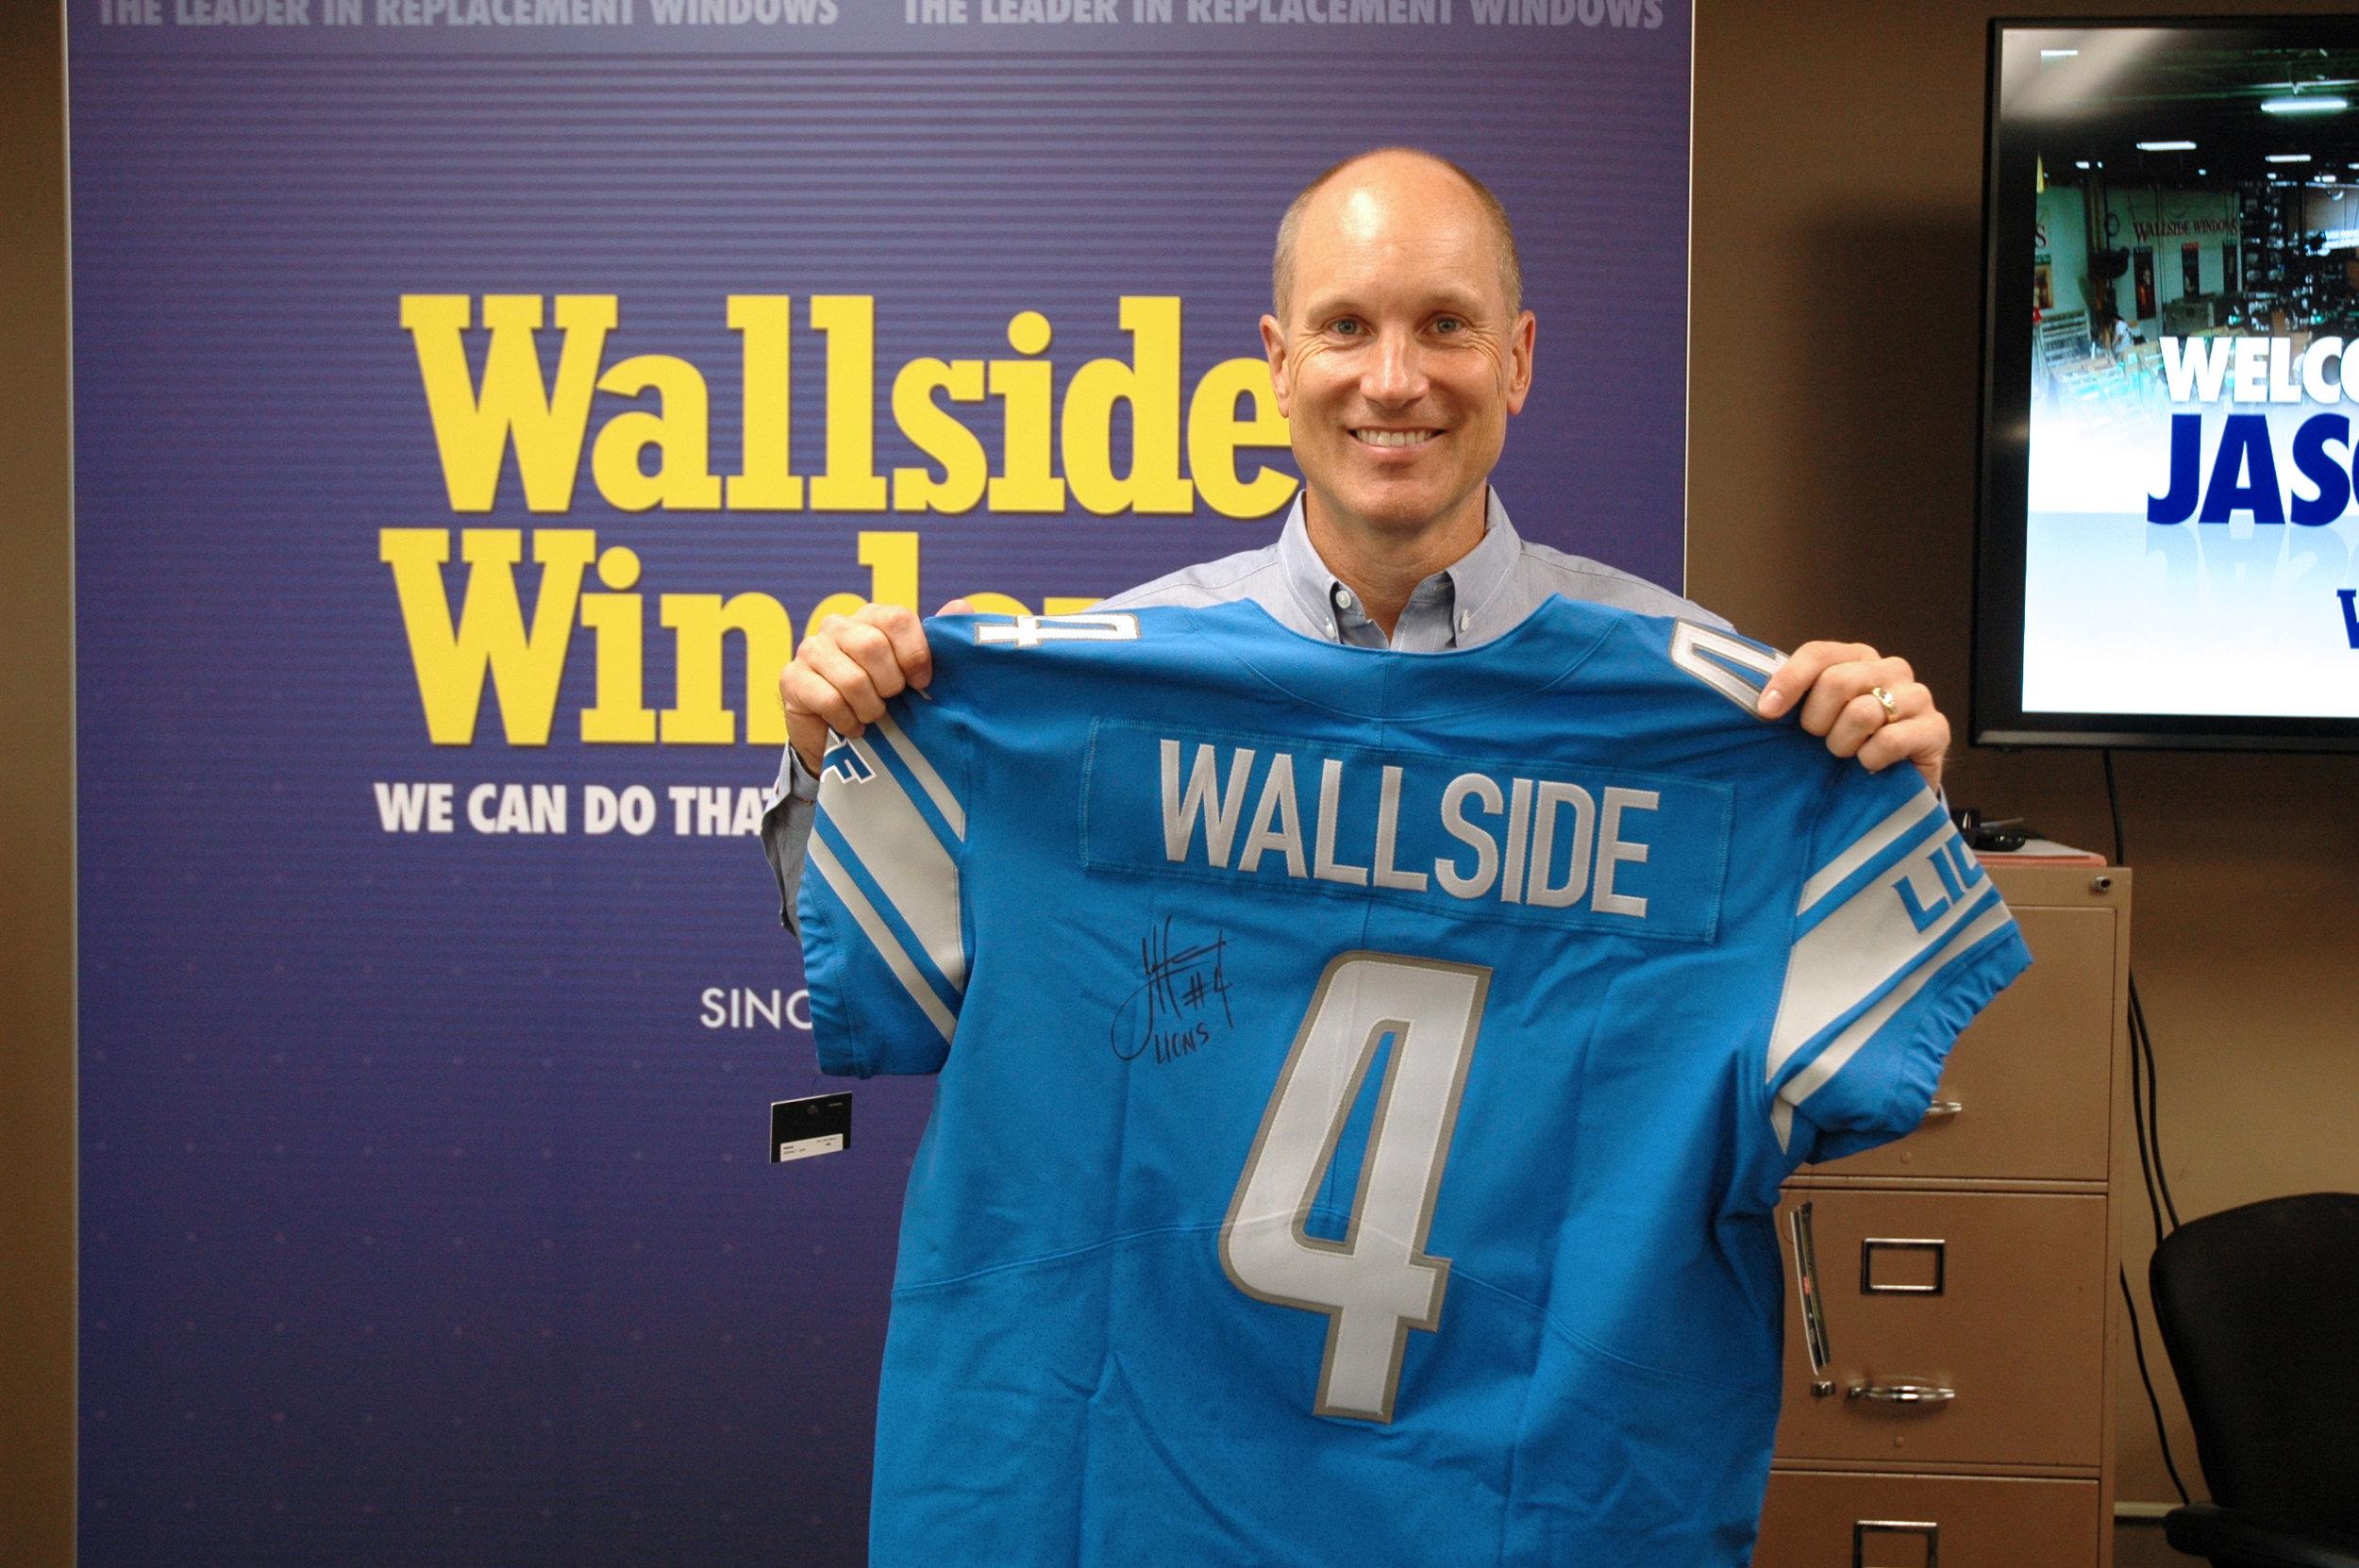 Wallside Windows staff welcomes former Detroit Lion Jason Hanson ...